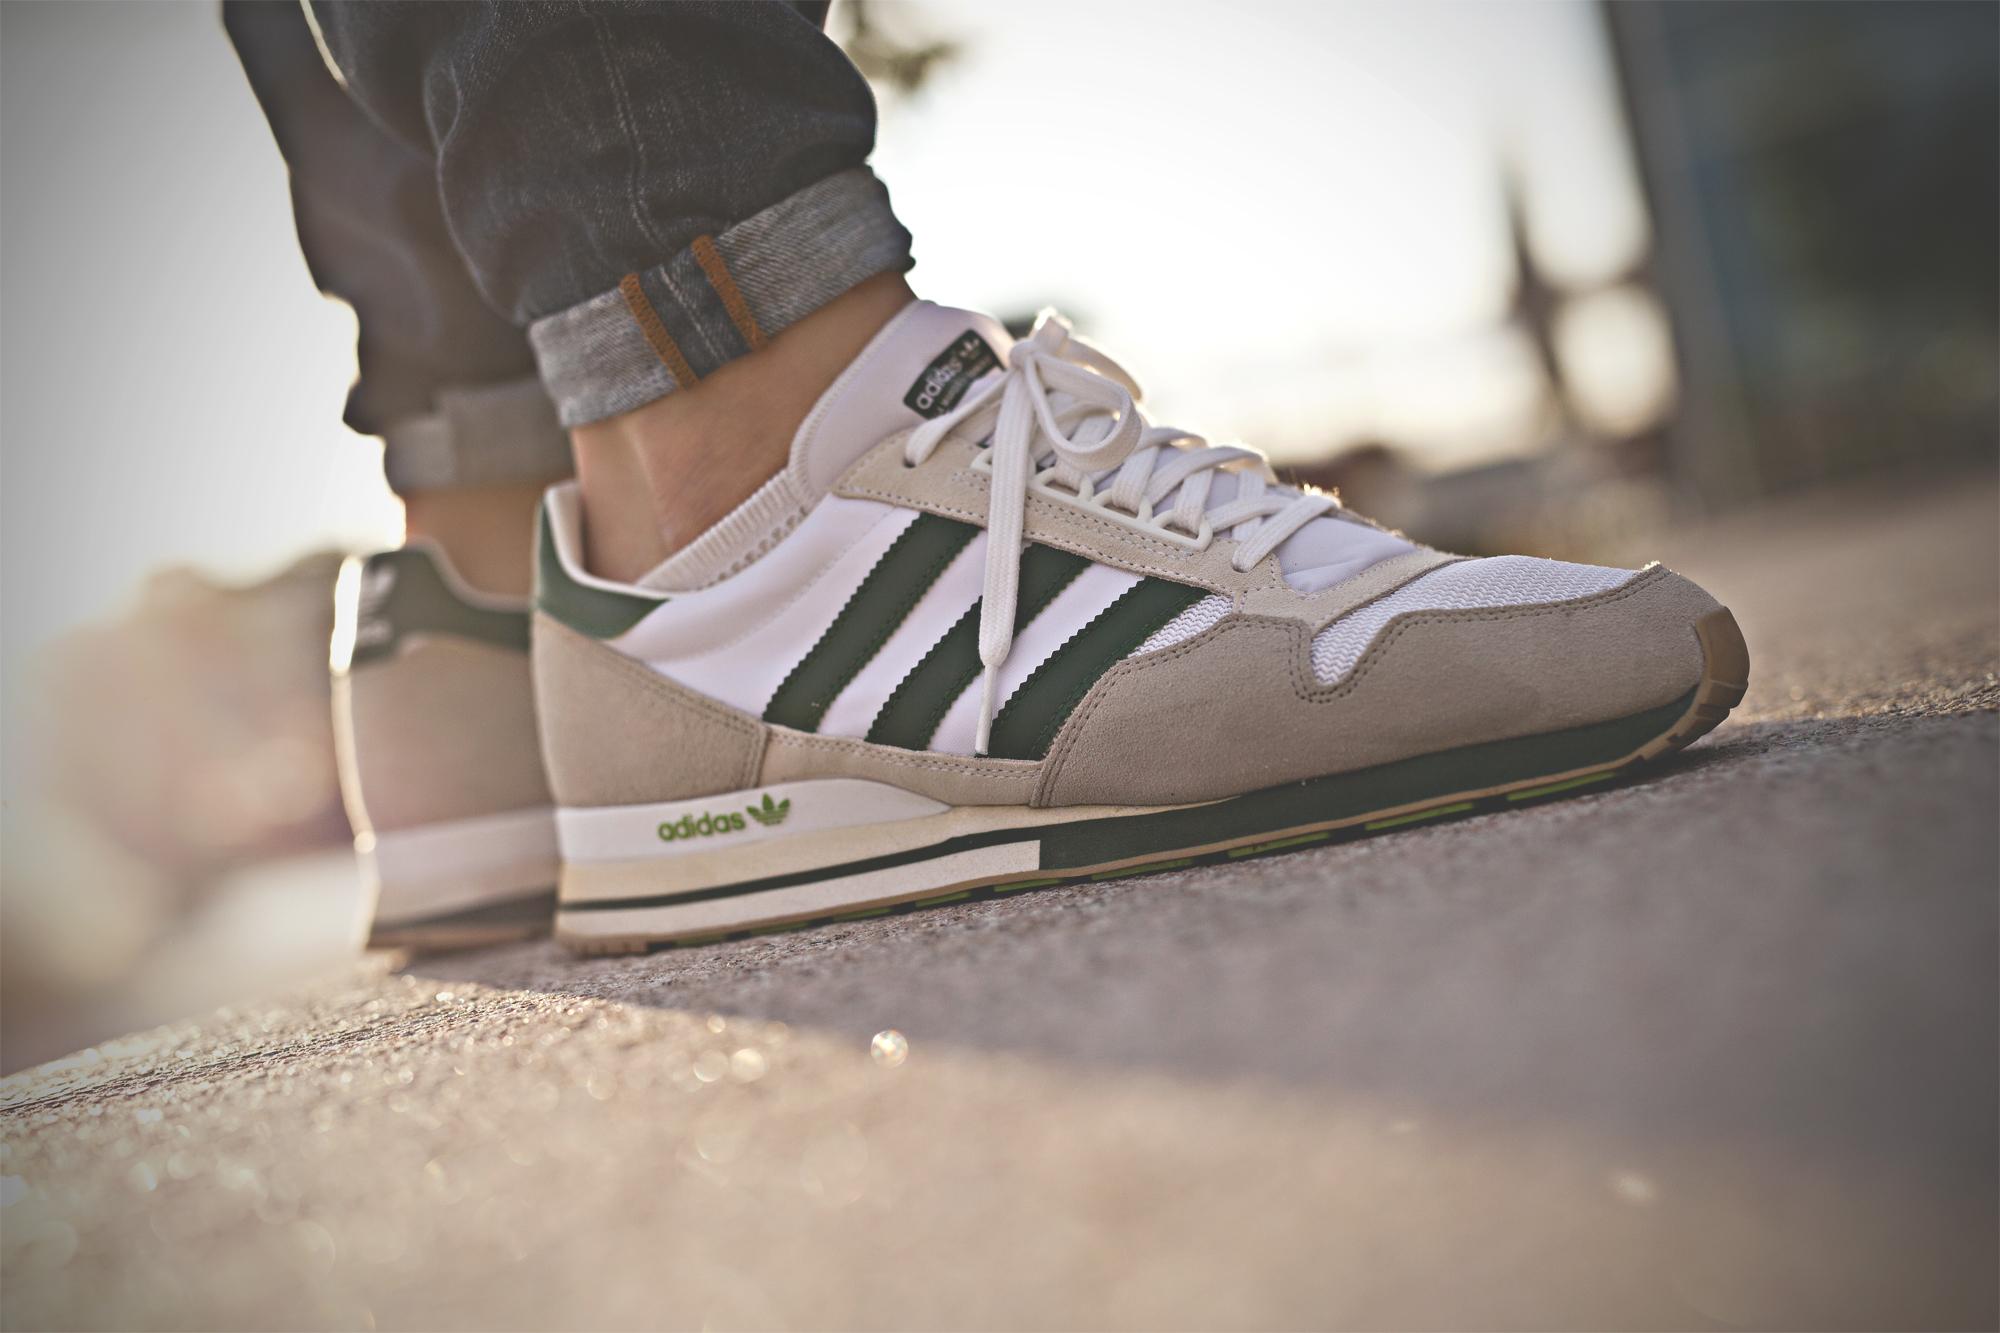 finest selection c94c5 31df5 UNITED ARROWS x Adidas Originals ZX500 OG UA. — Oslo Sneaker ...